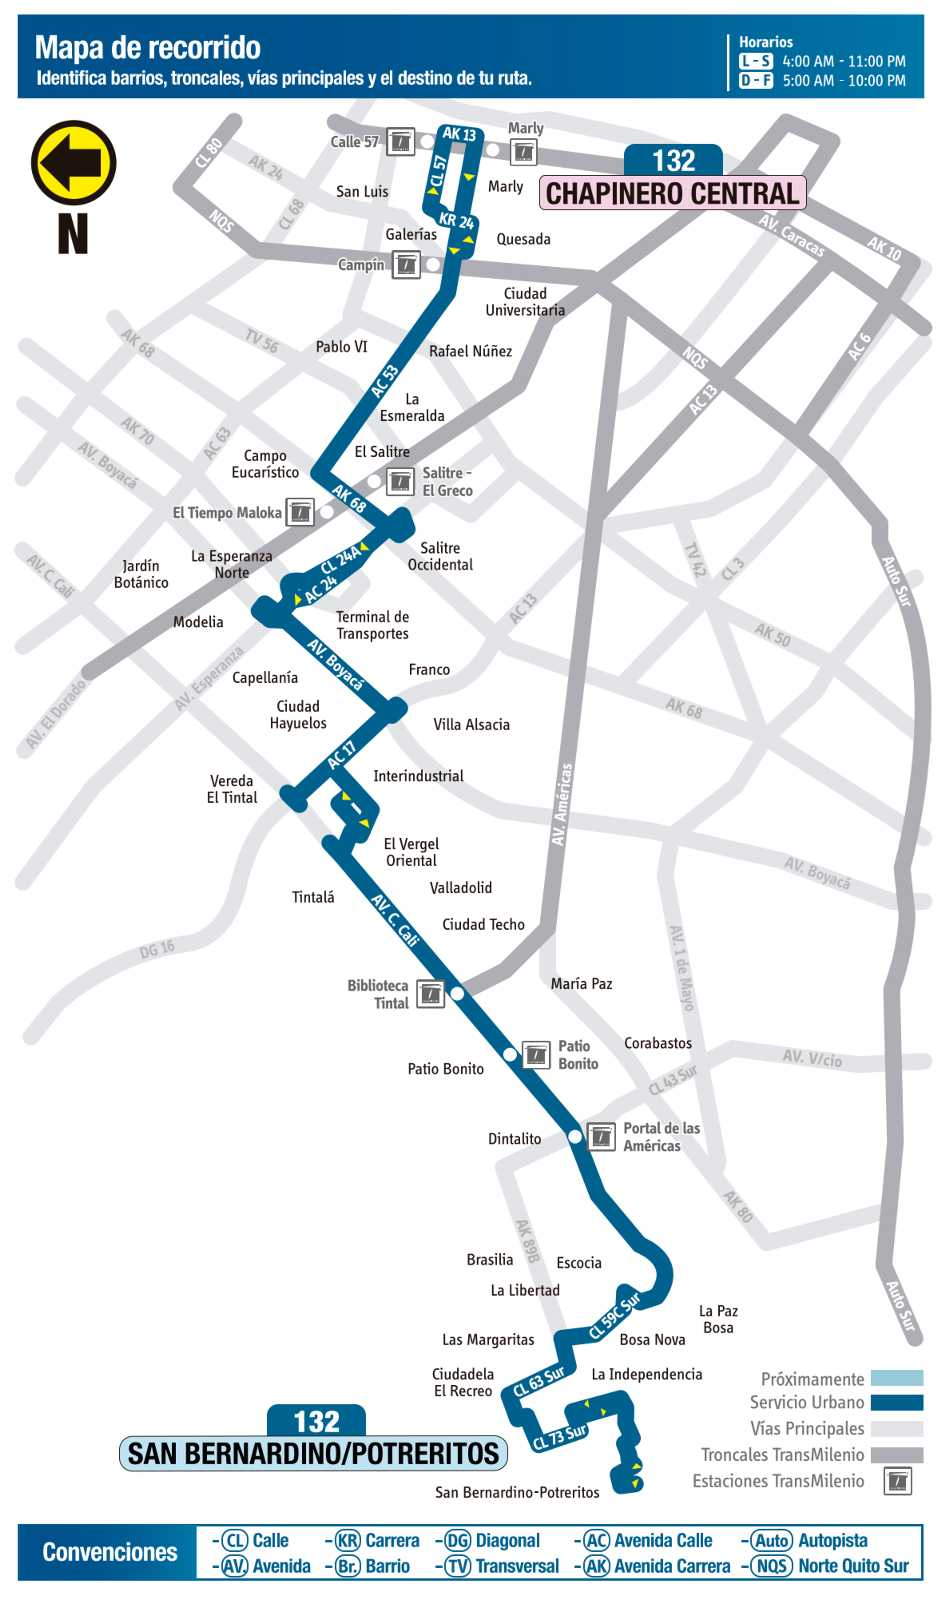 Ruta SITP: 132 San Bernardino / Potreritos ↔ Chapinero Central (mapa)